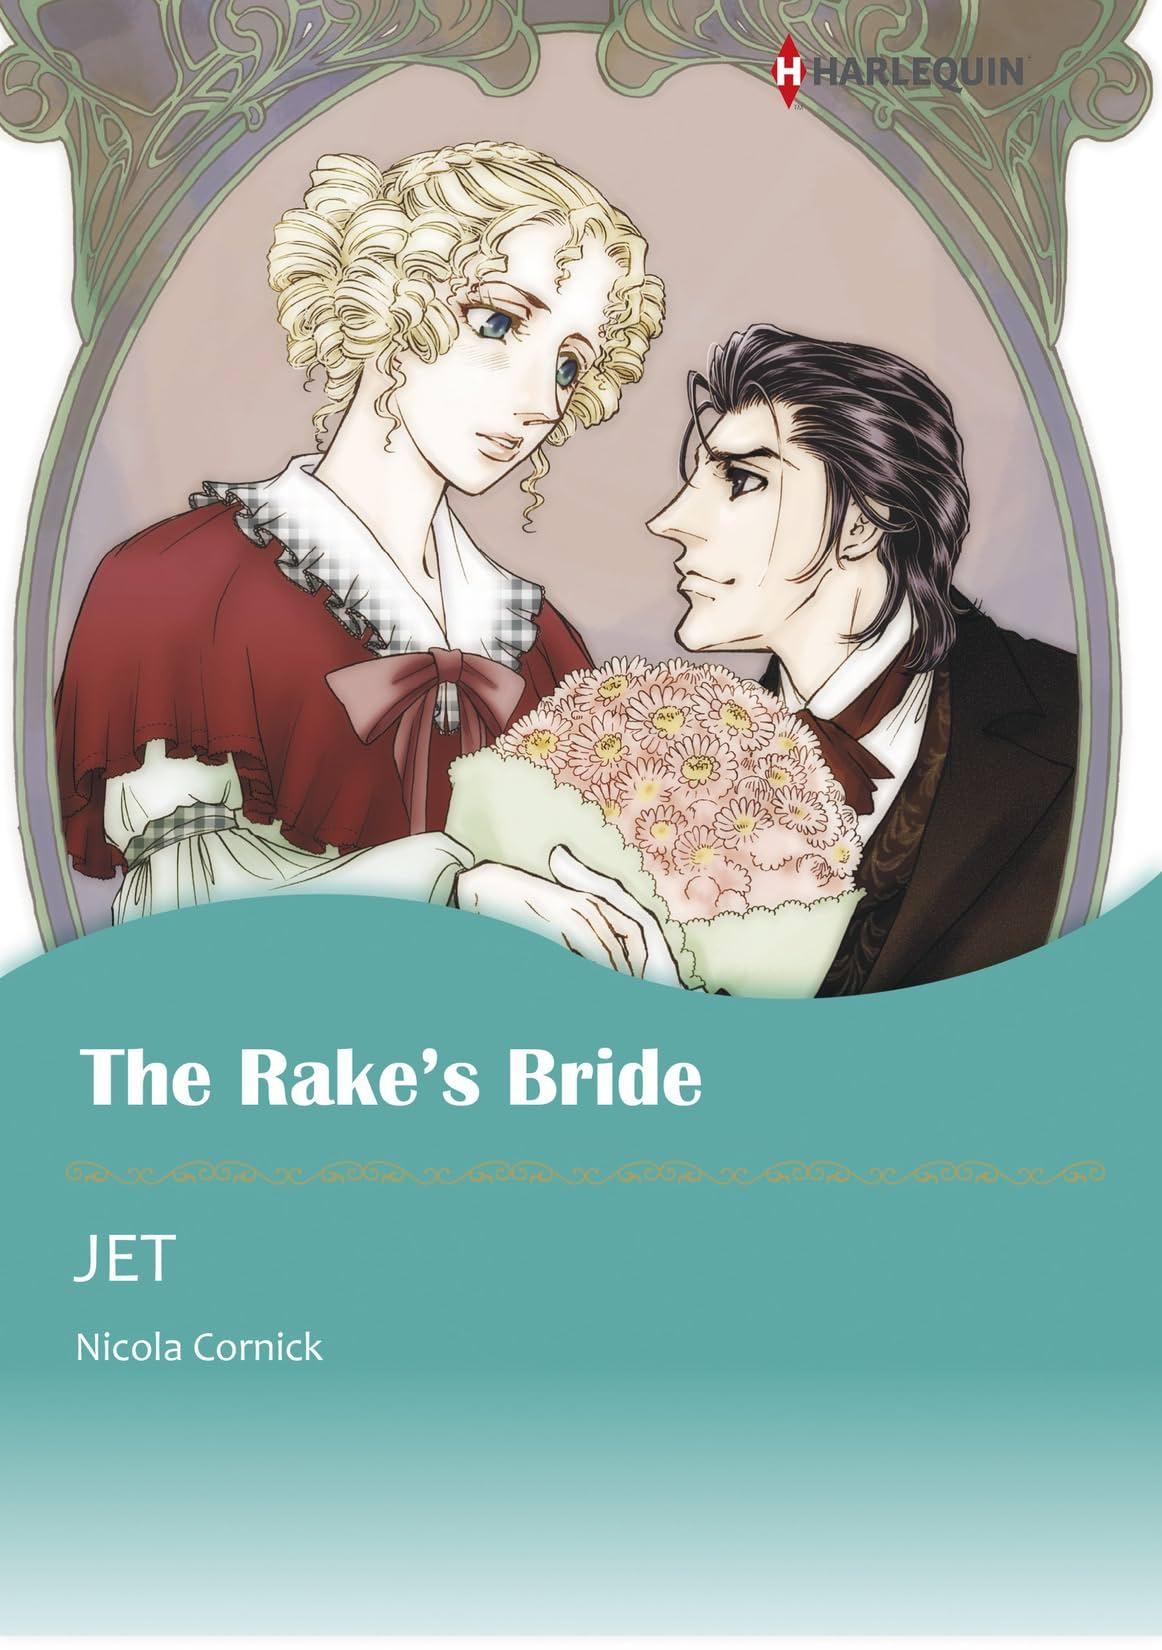 The Rake's Bride